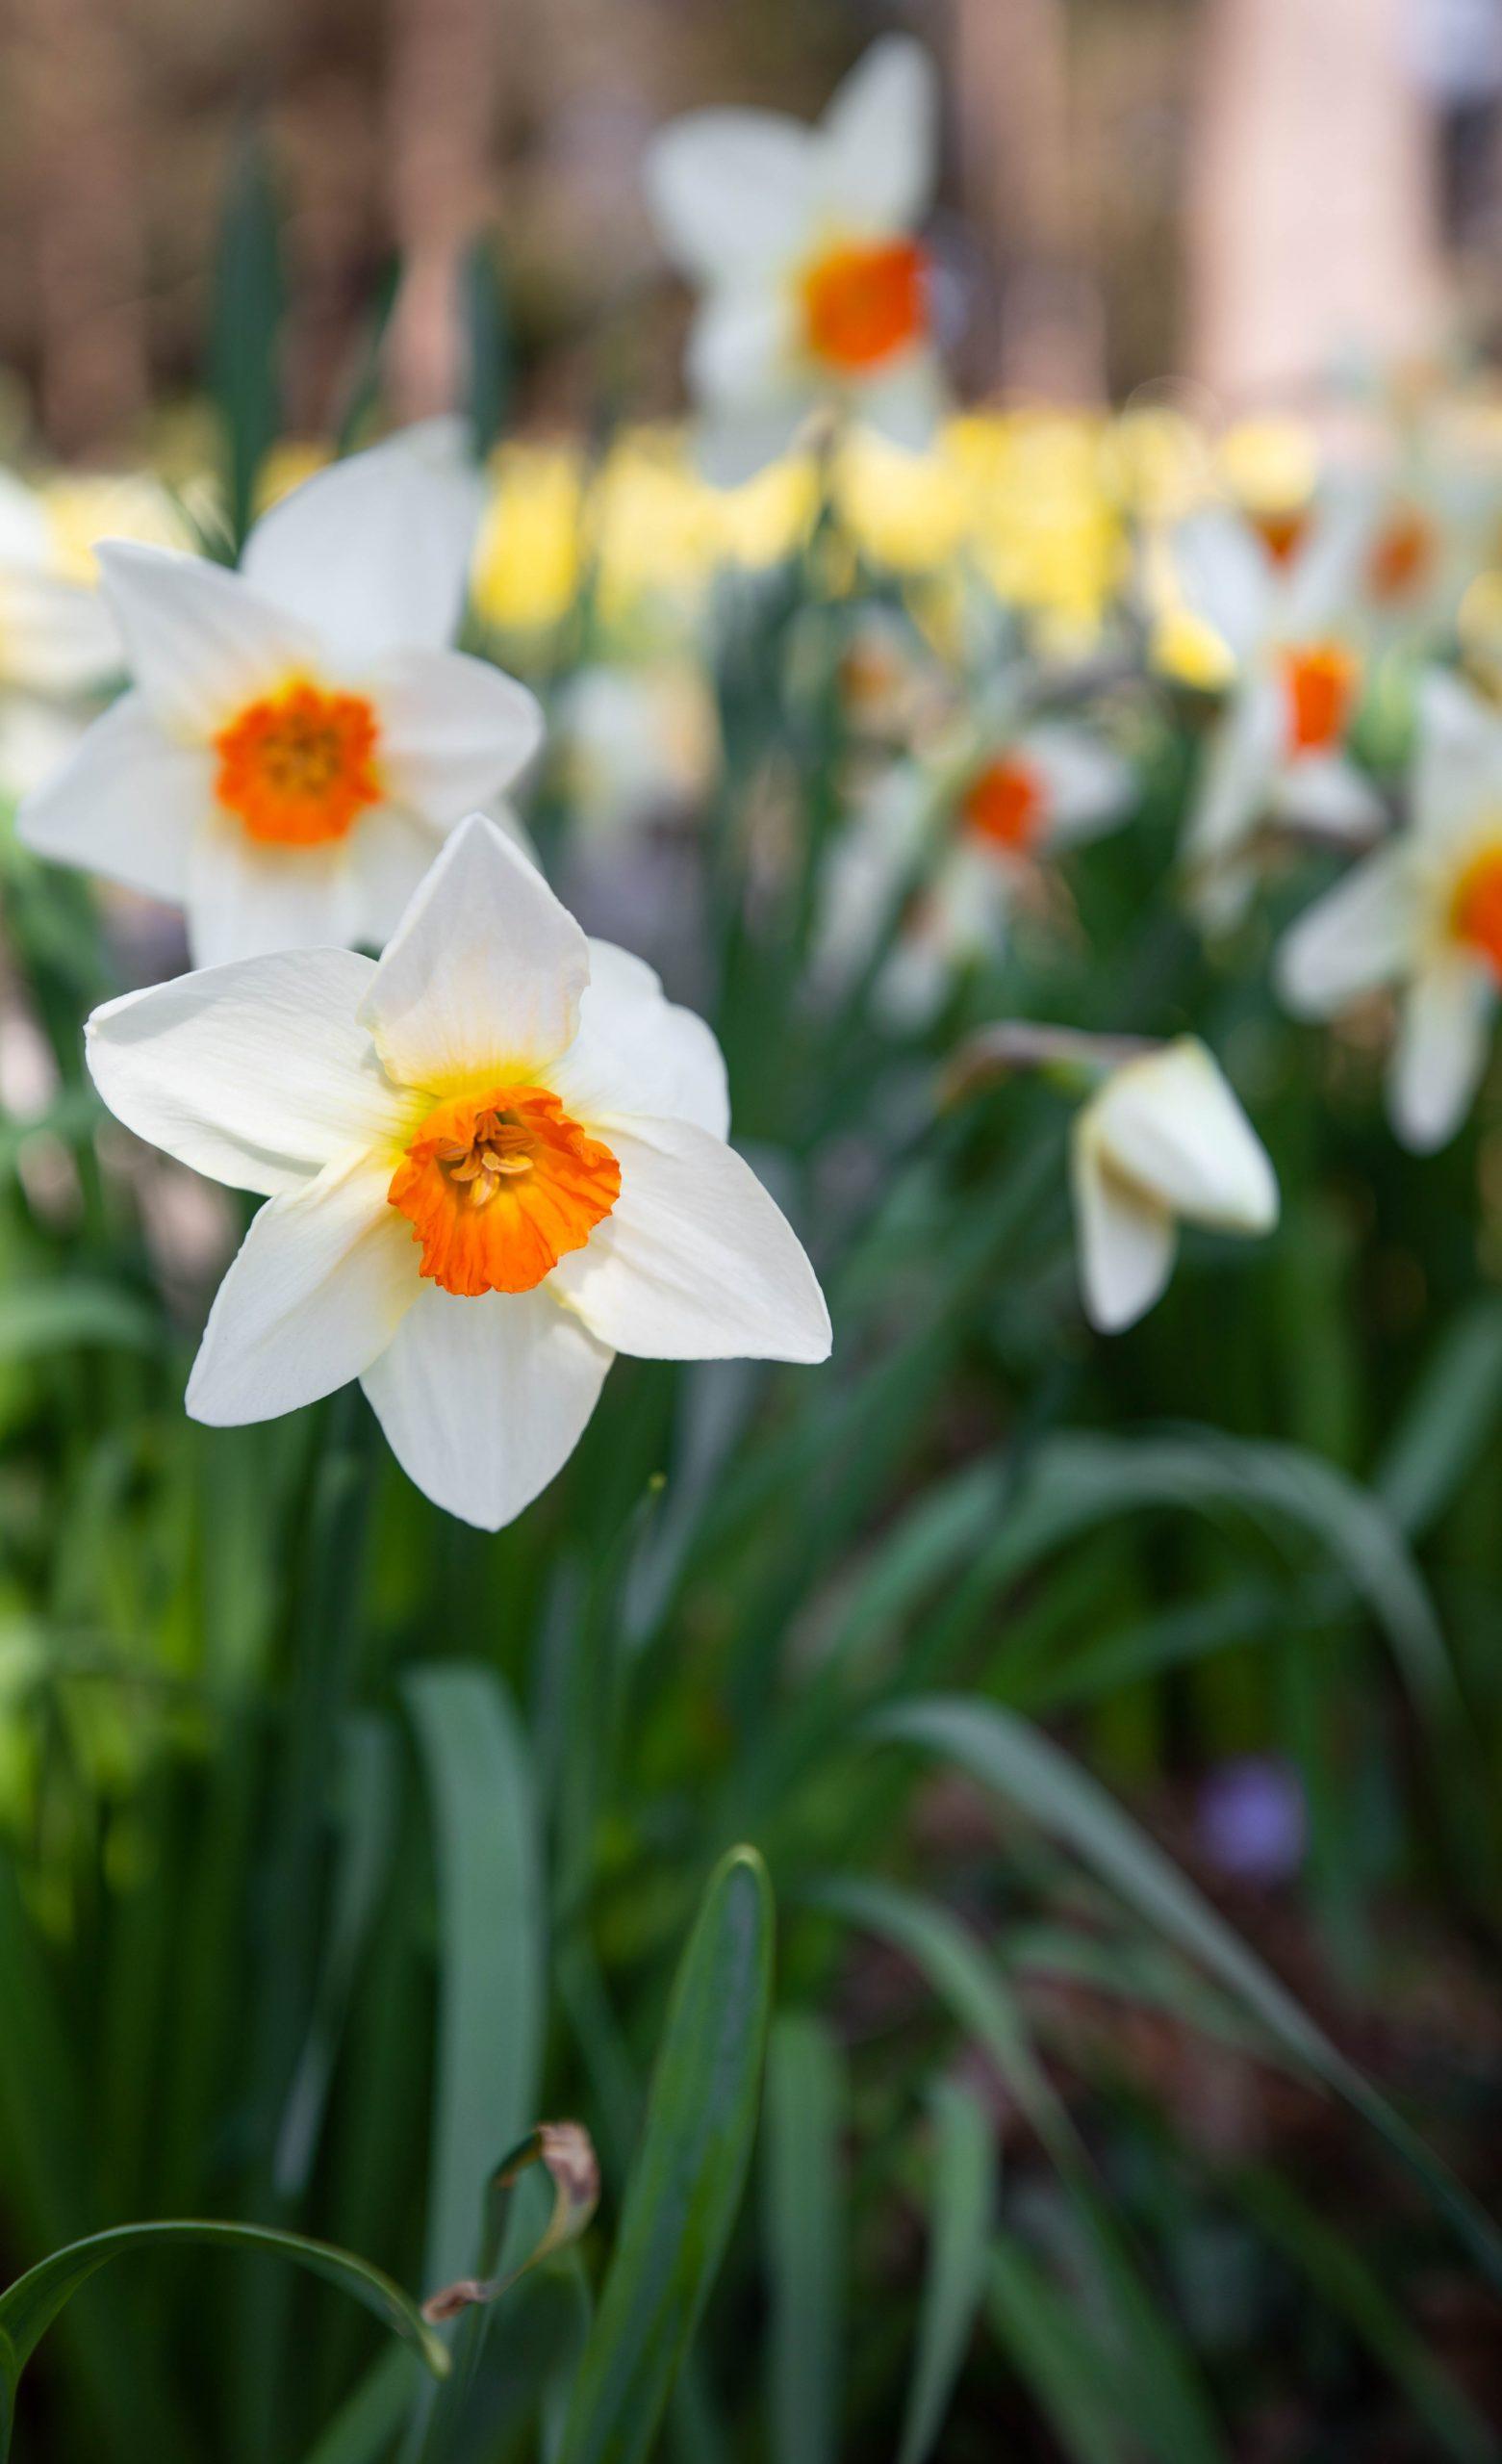 Daffodil Days at Bilthwold Mansion in Newport, Rhode Island by Annie Fairfax